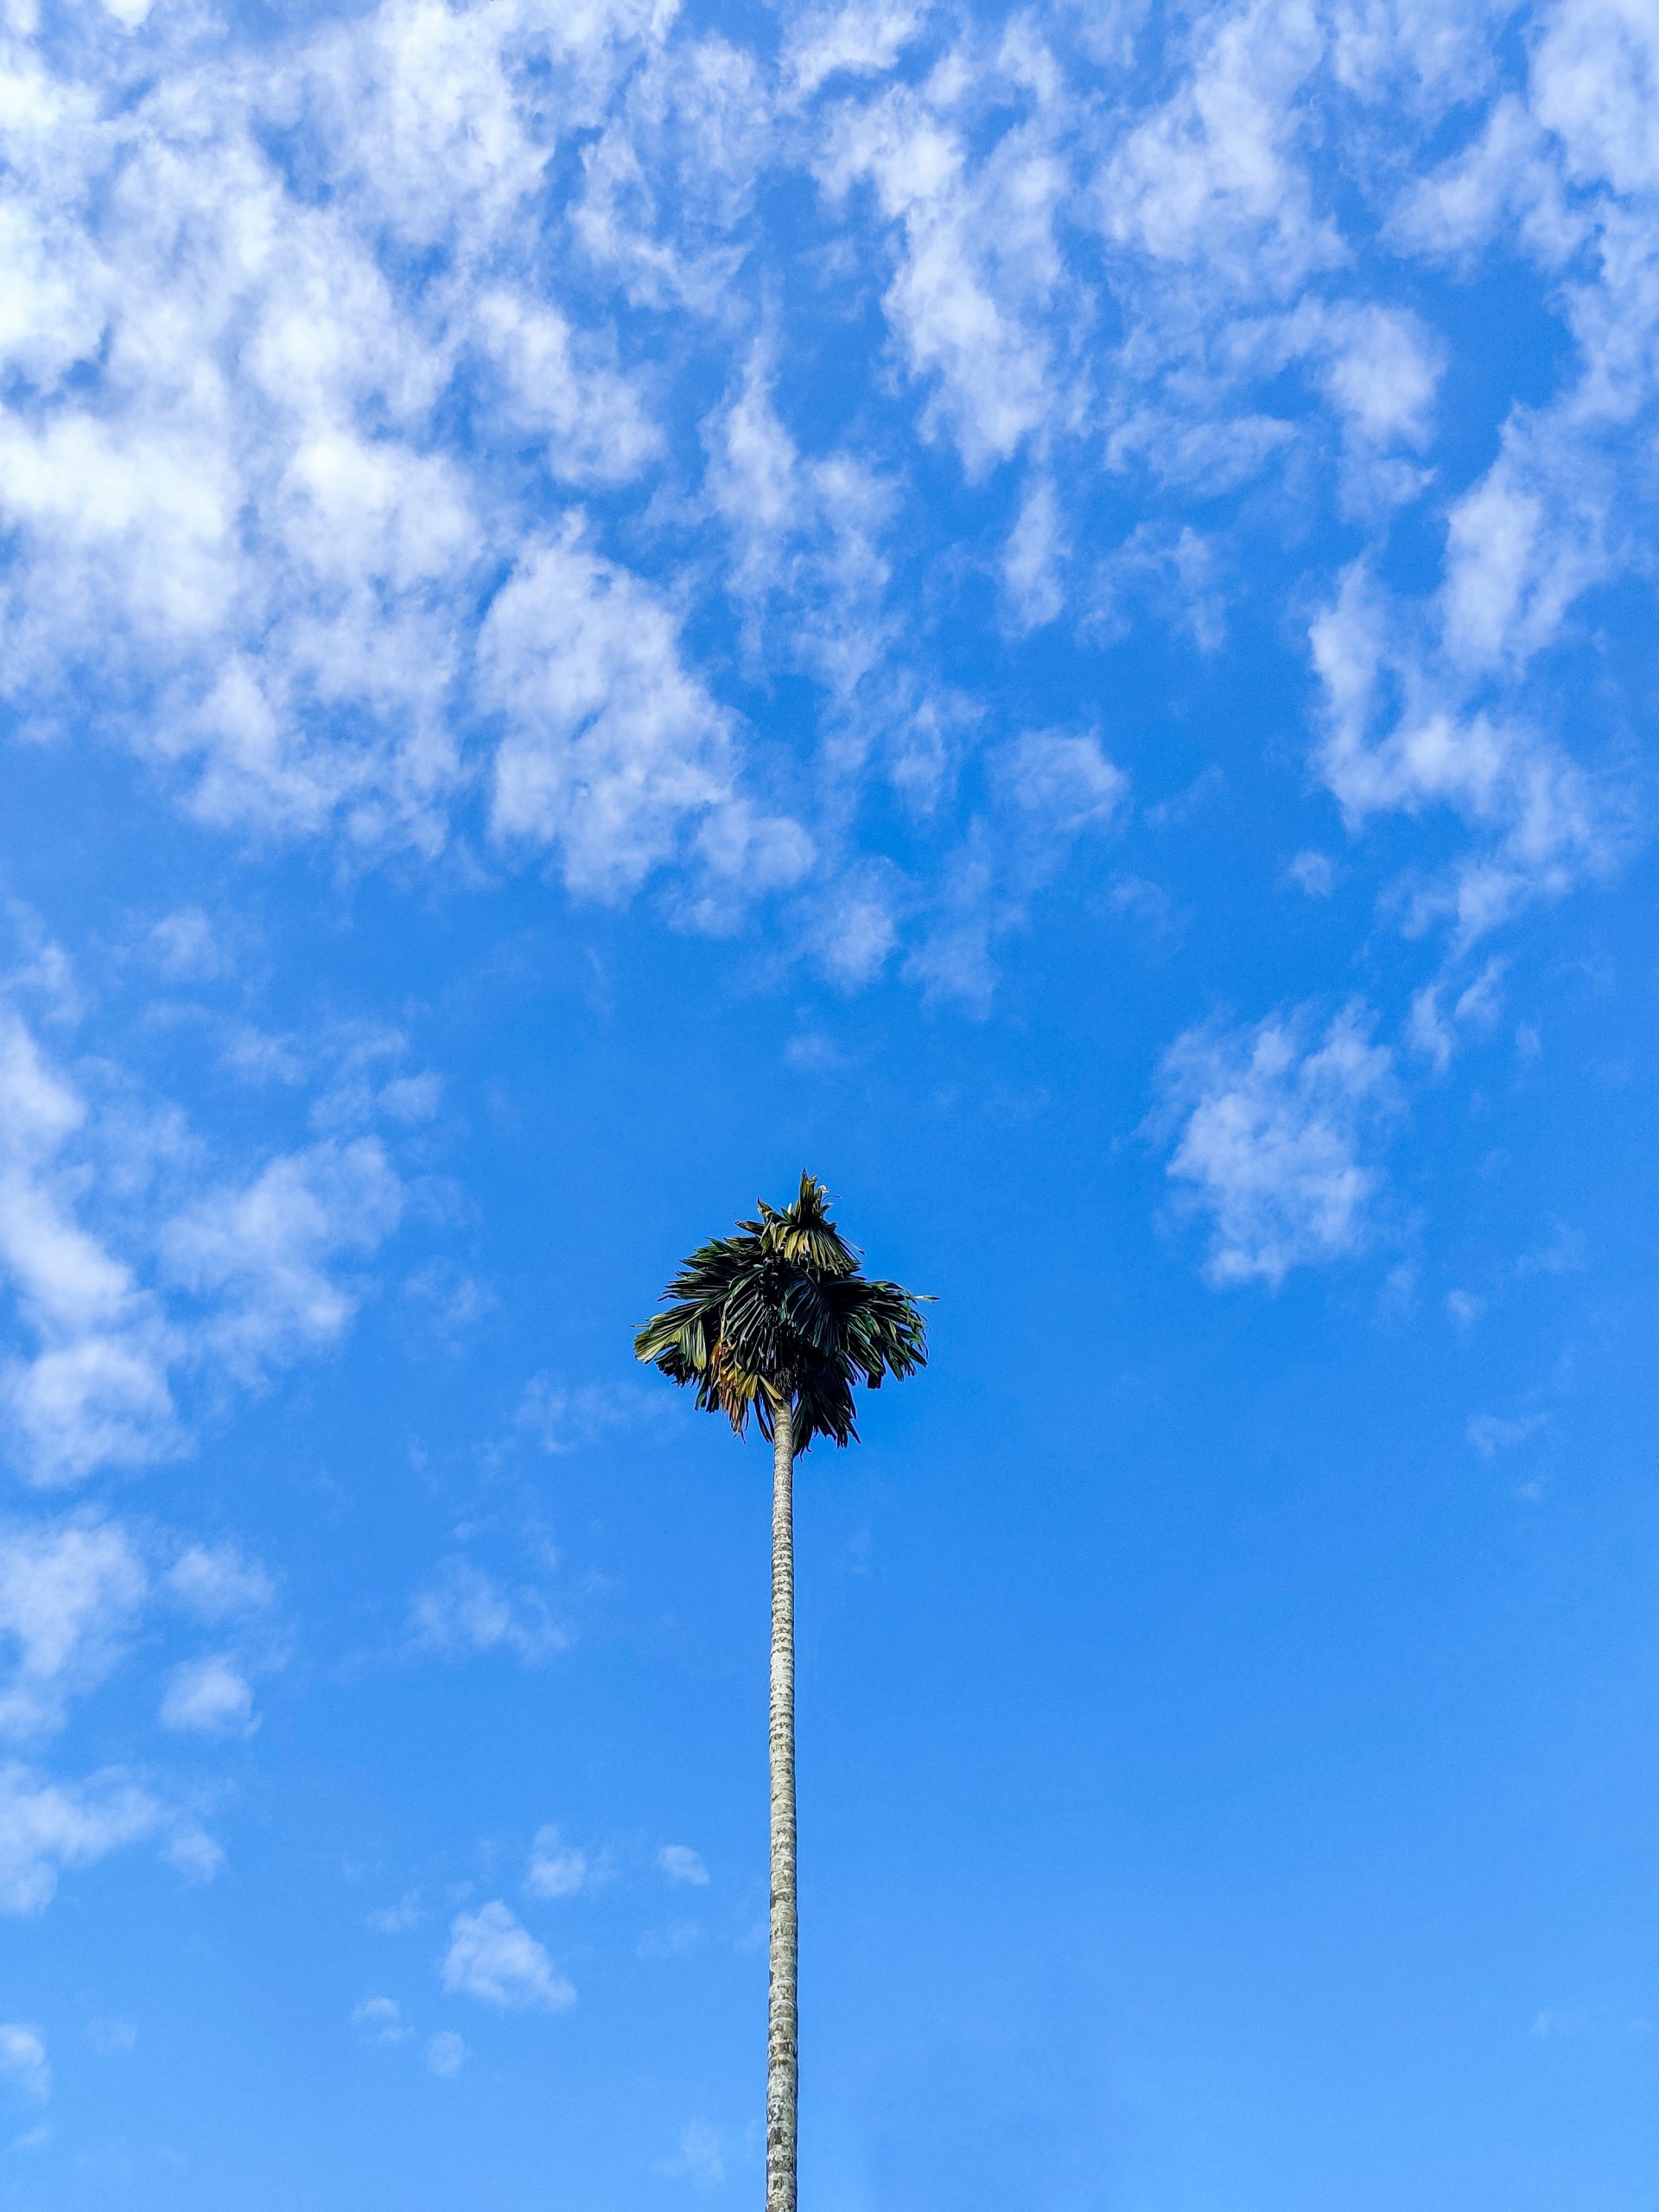 A high coconut tree